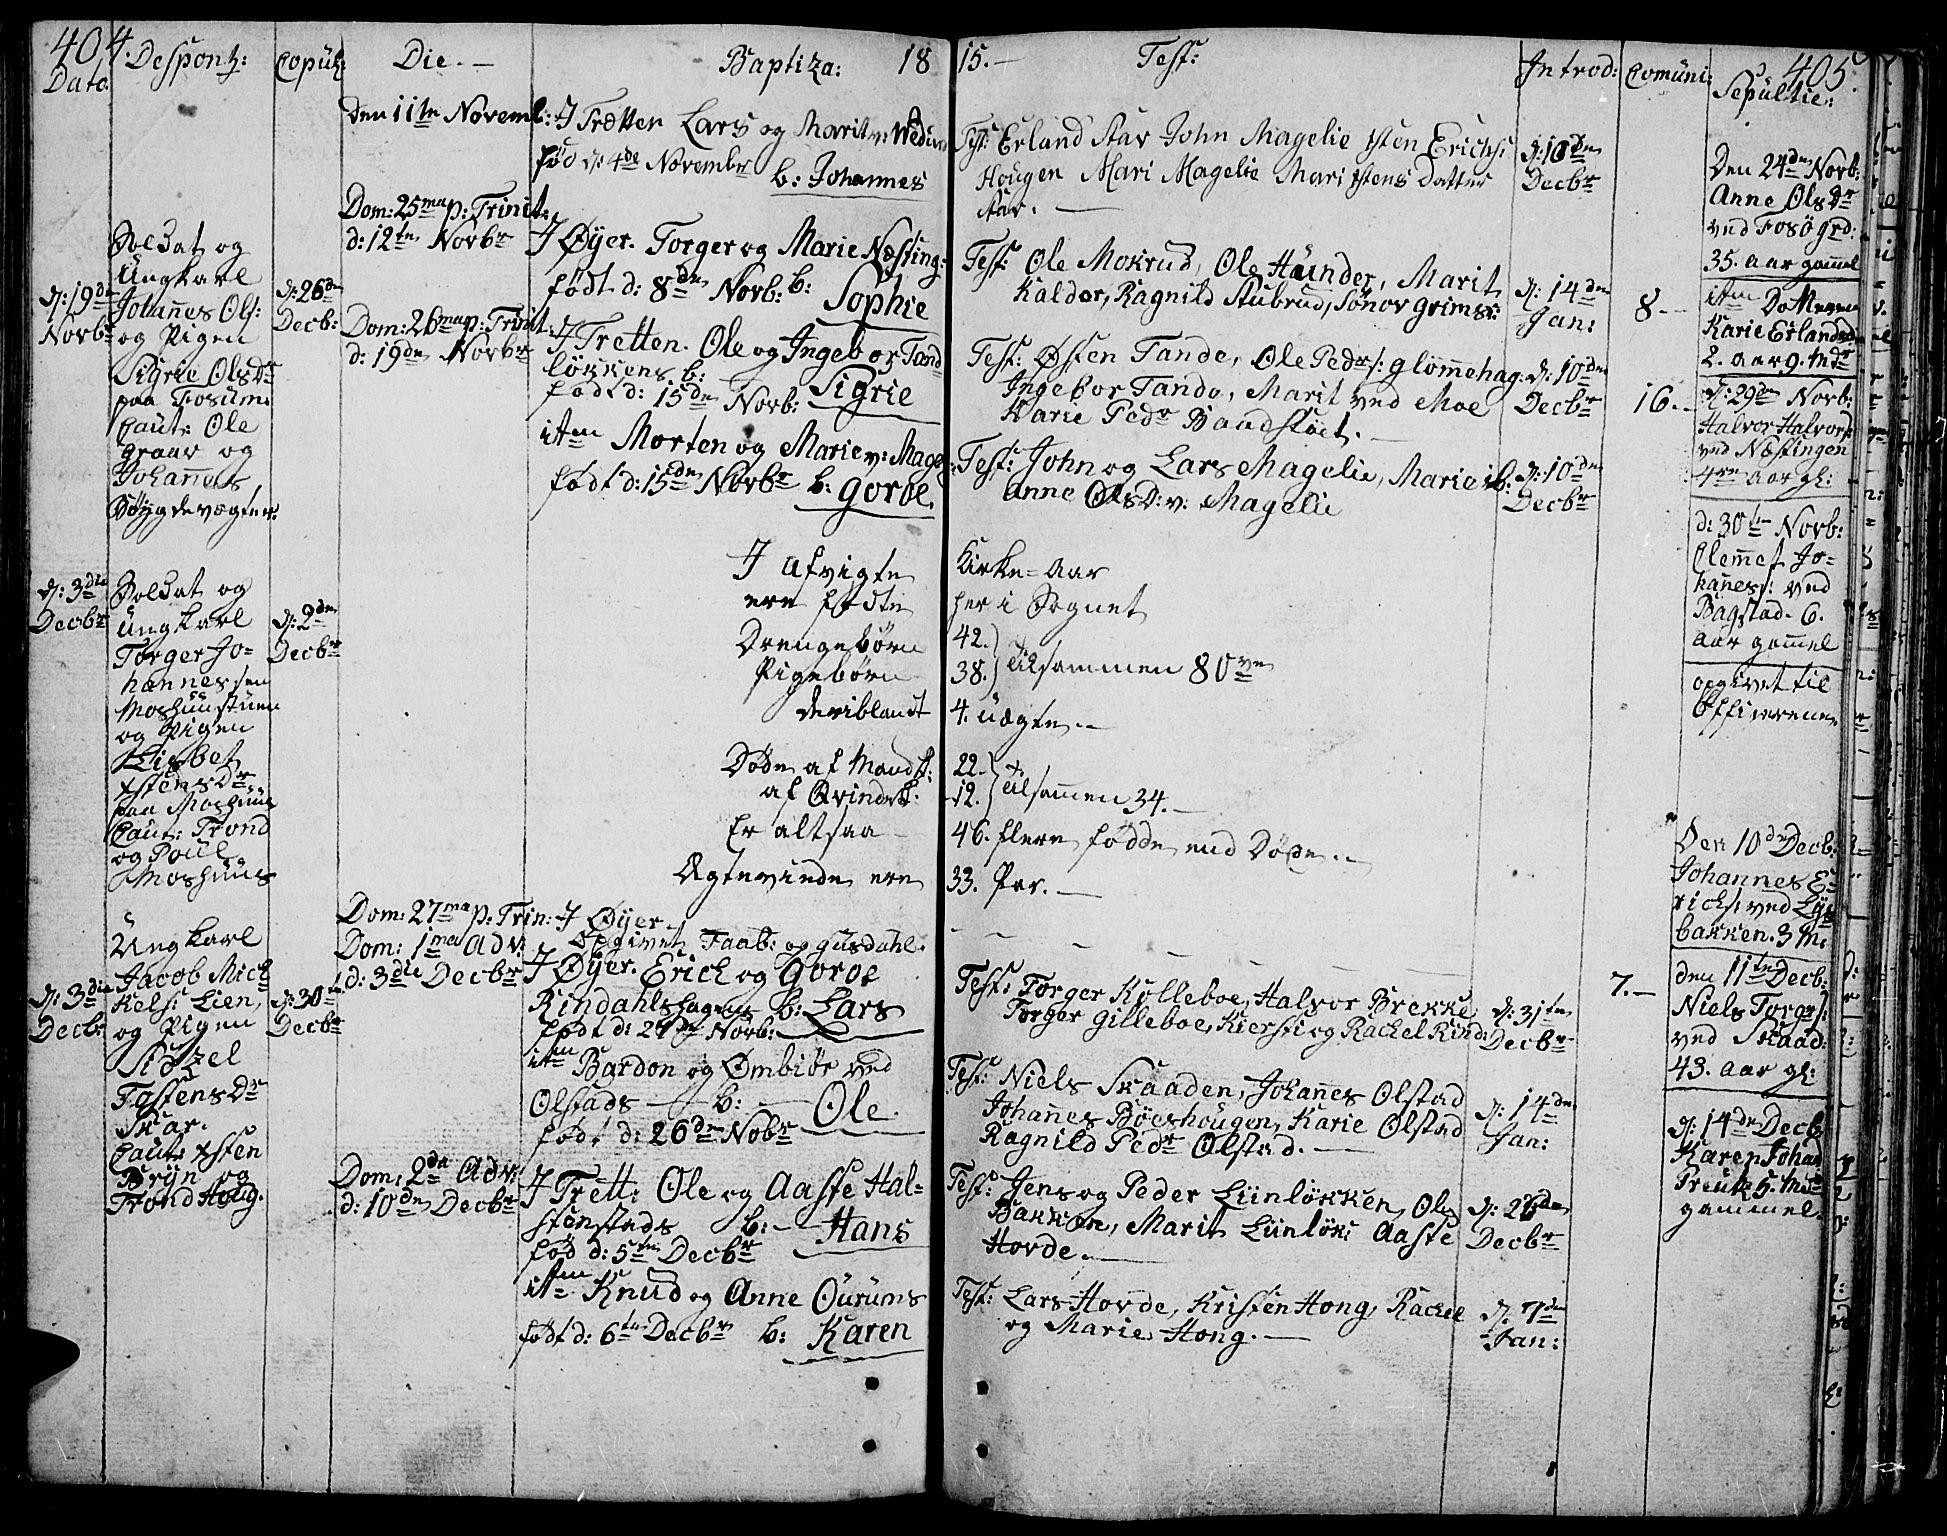 SAH, Øyer prestekontor, Ministerialbok nr. 3, 1784-1824, s. 404-405